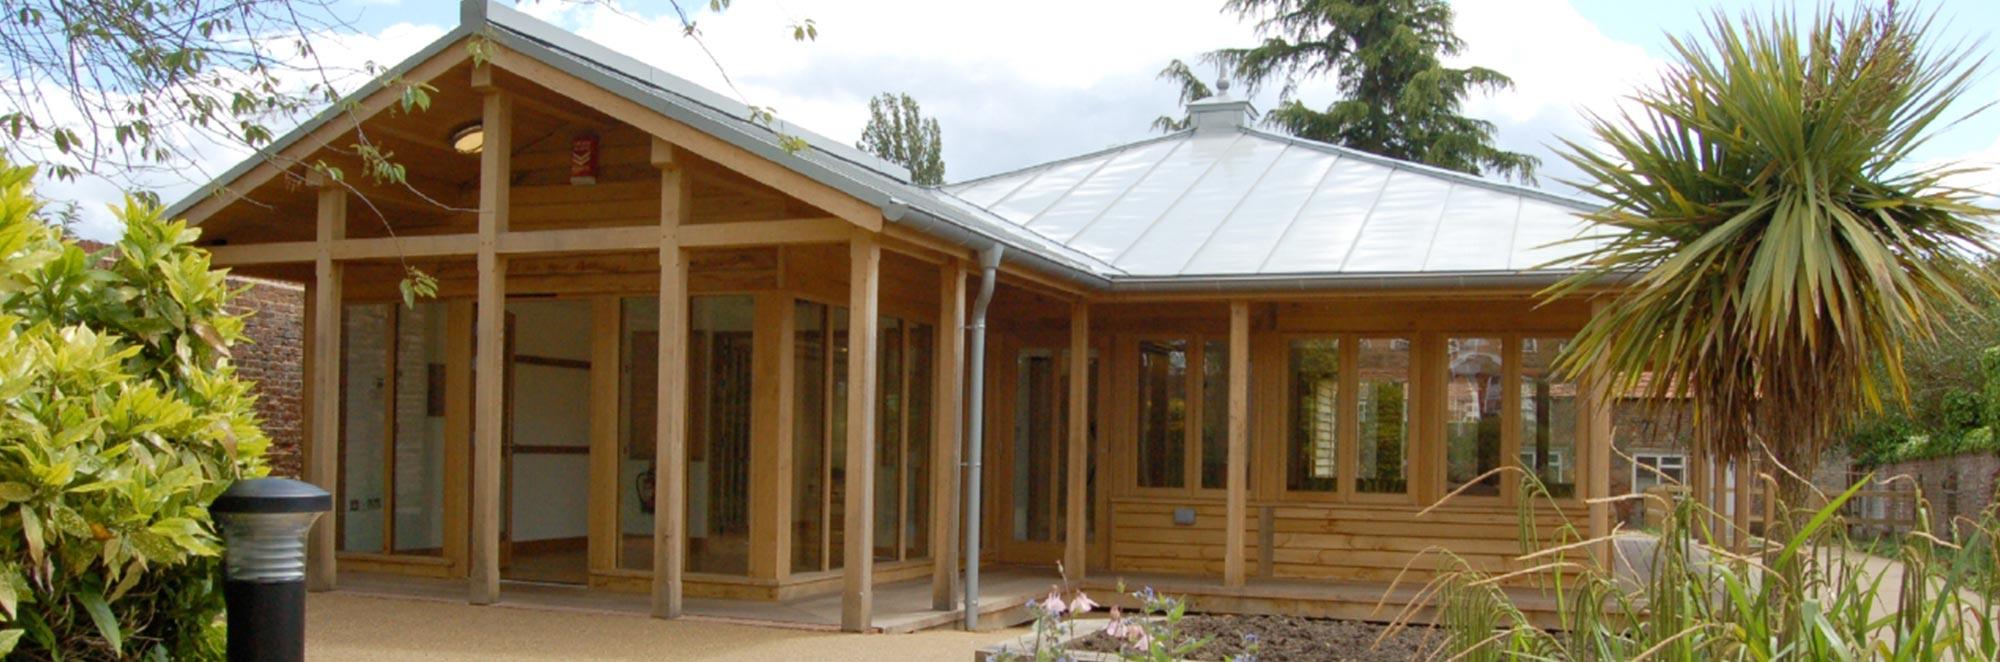 The Garden Gallery, Farnham